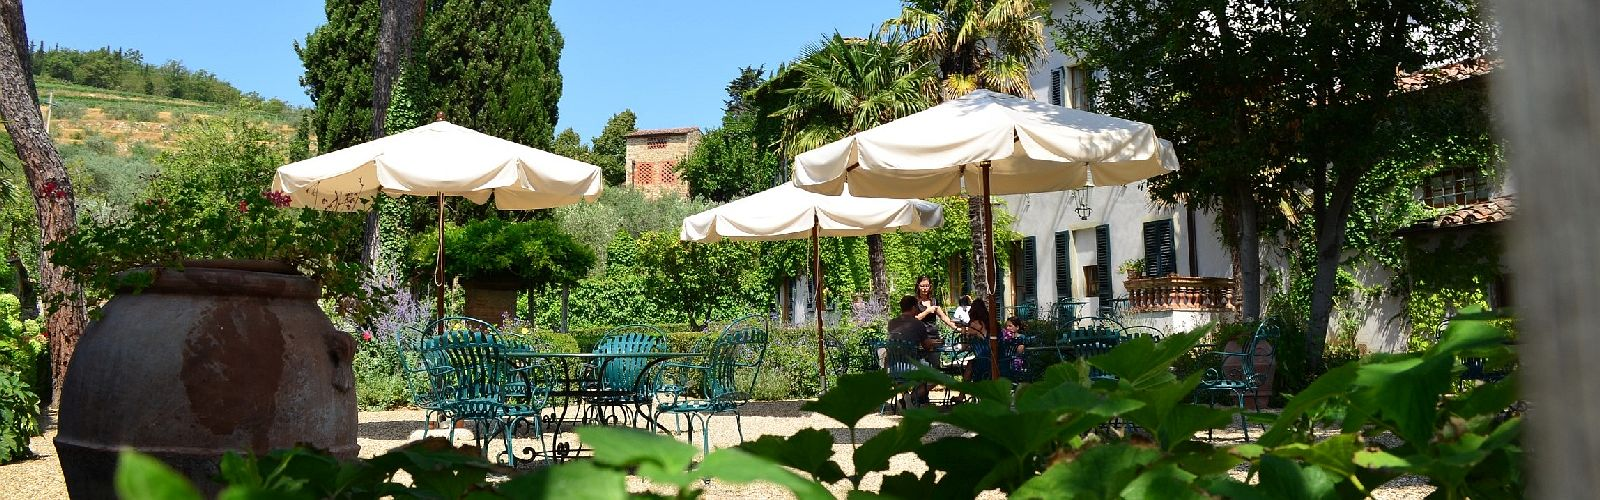 Stedenreis Toscane